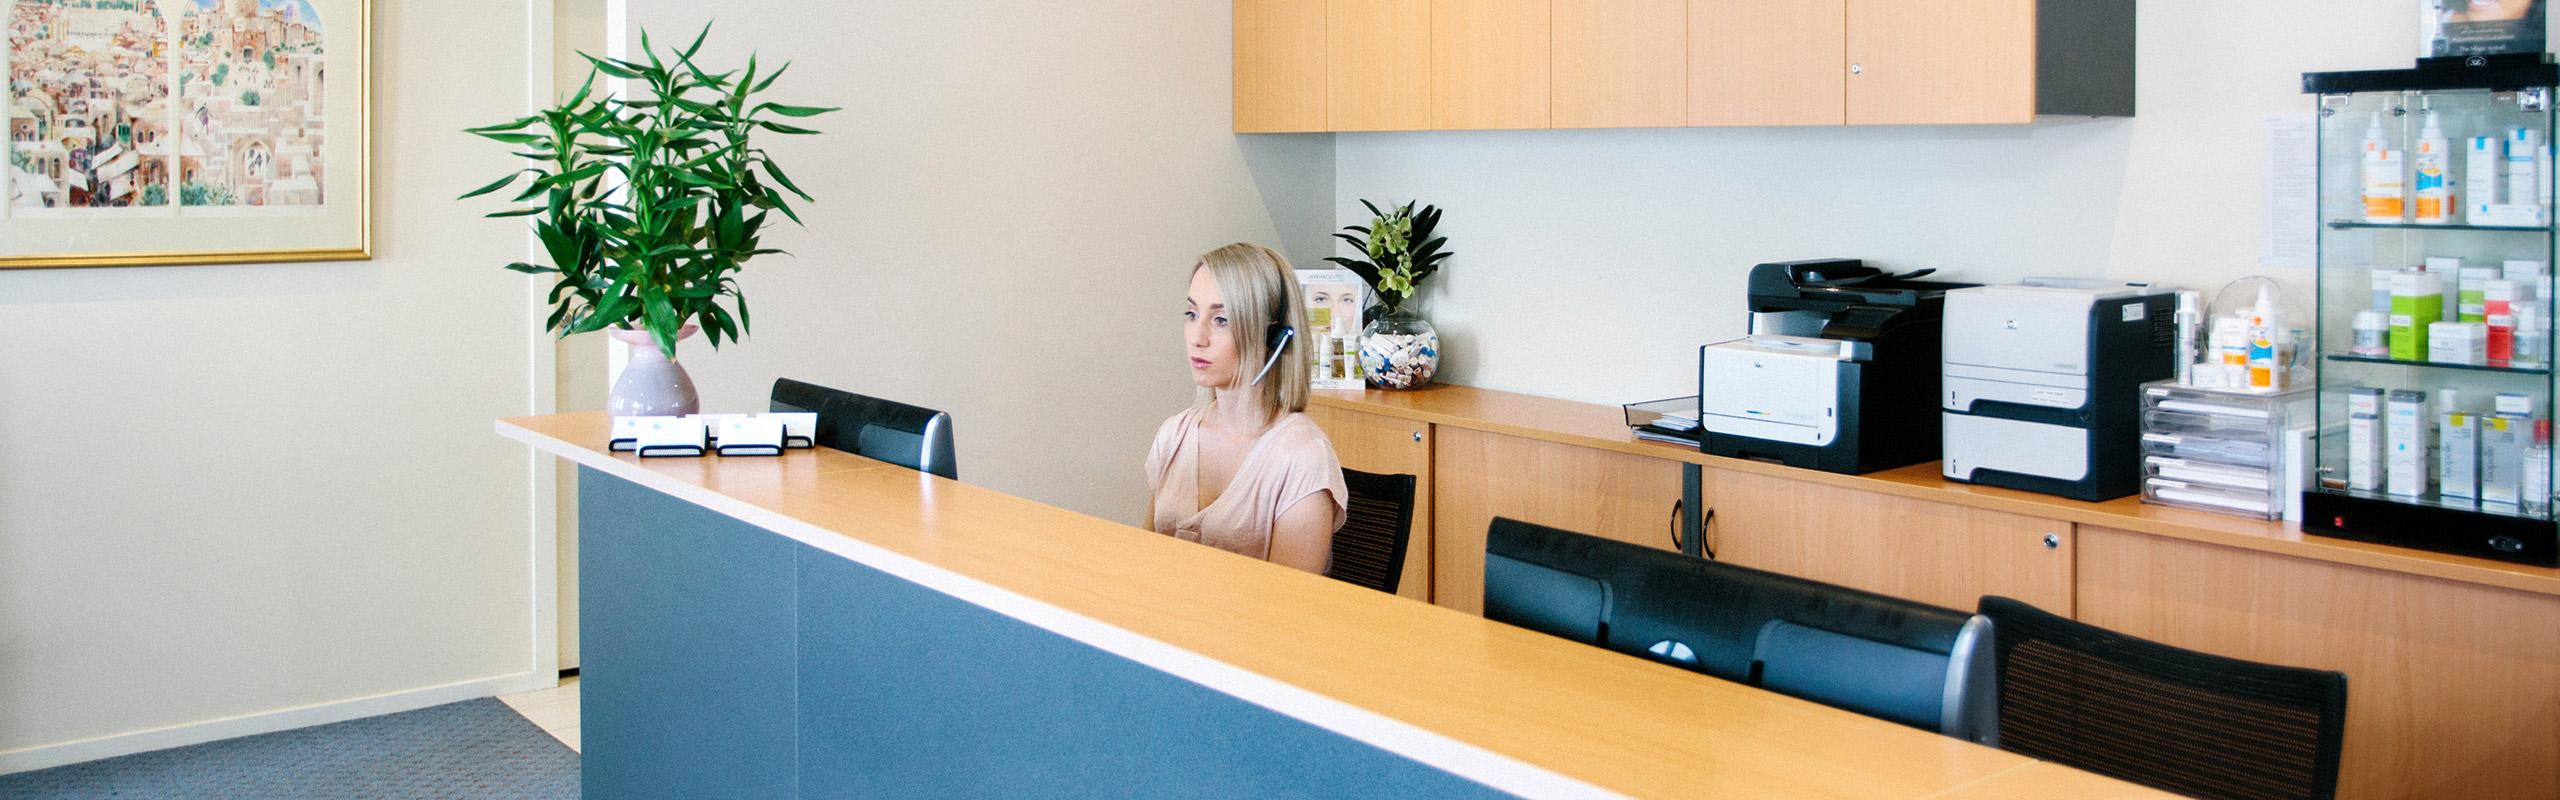 Bayside Reception - Dermatology Clinic - Brighton